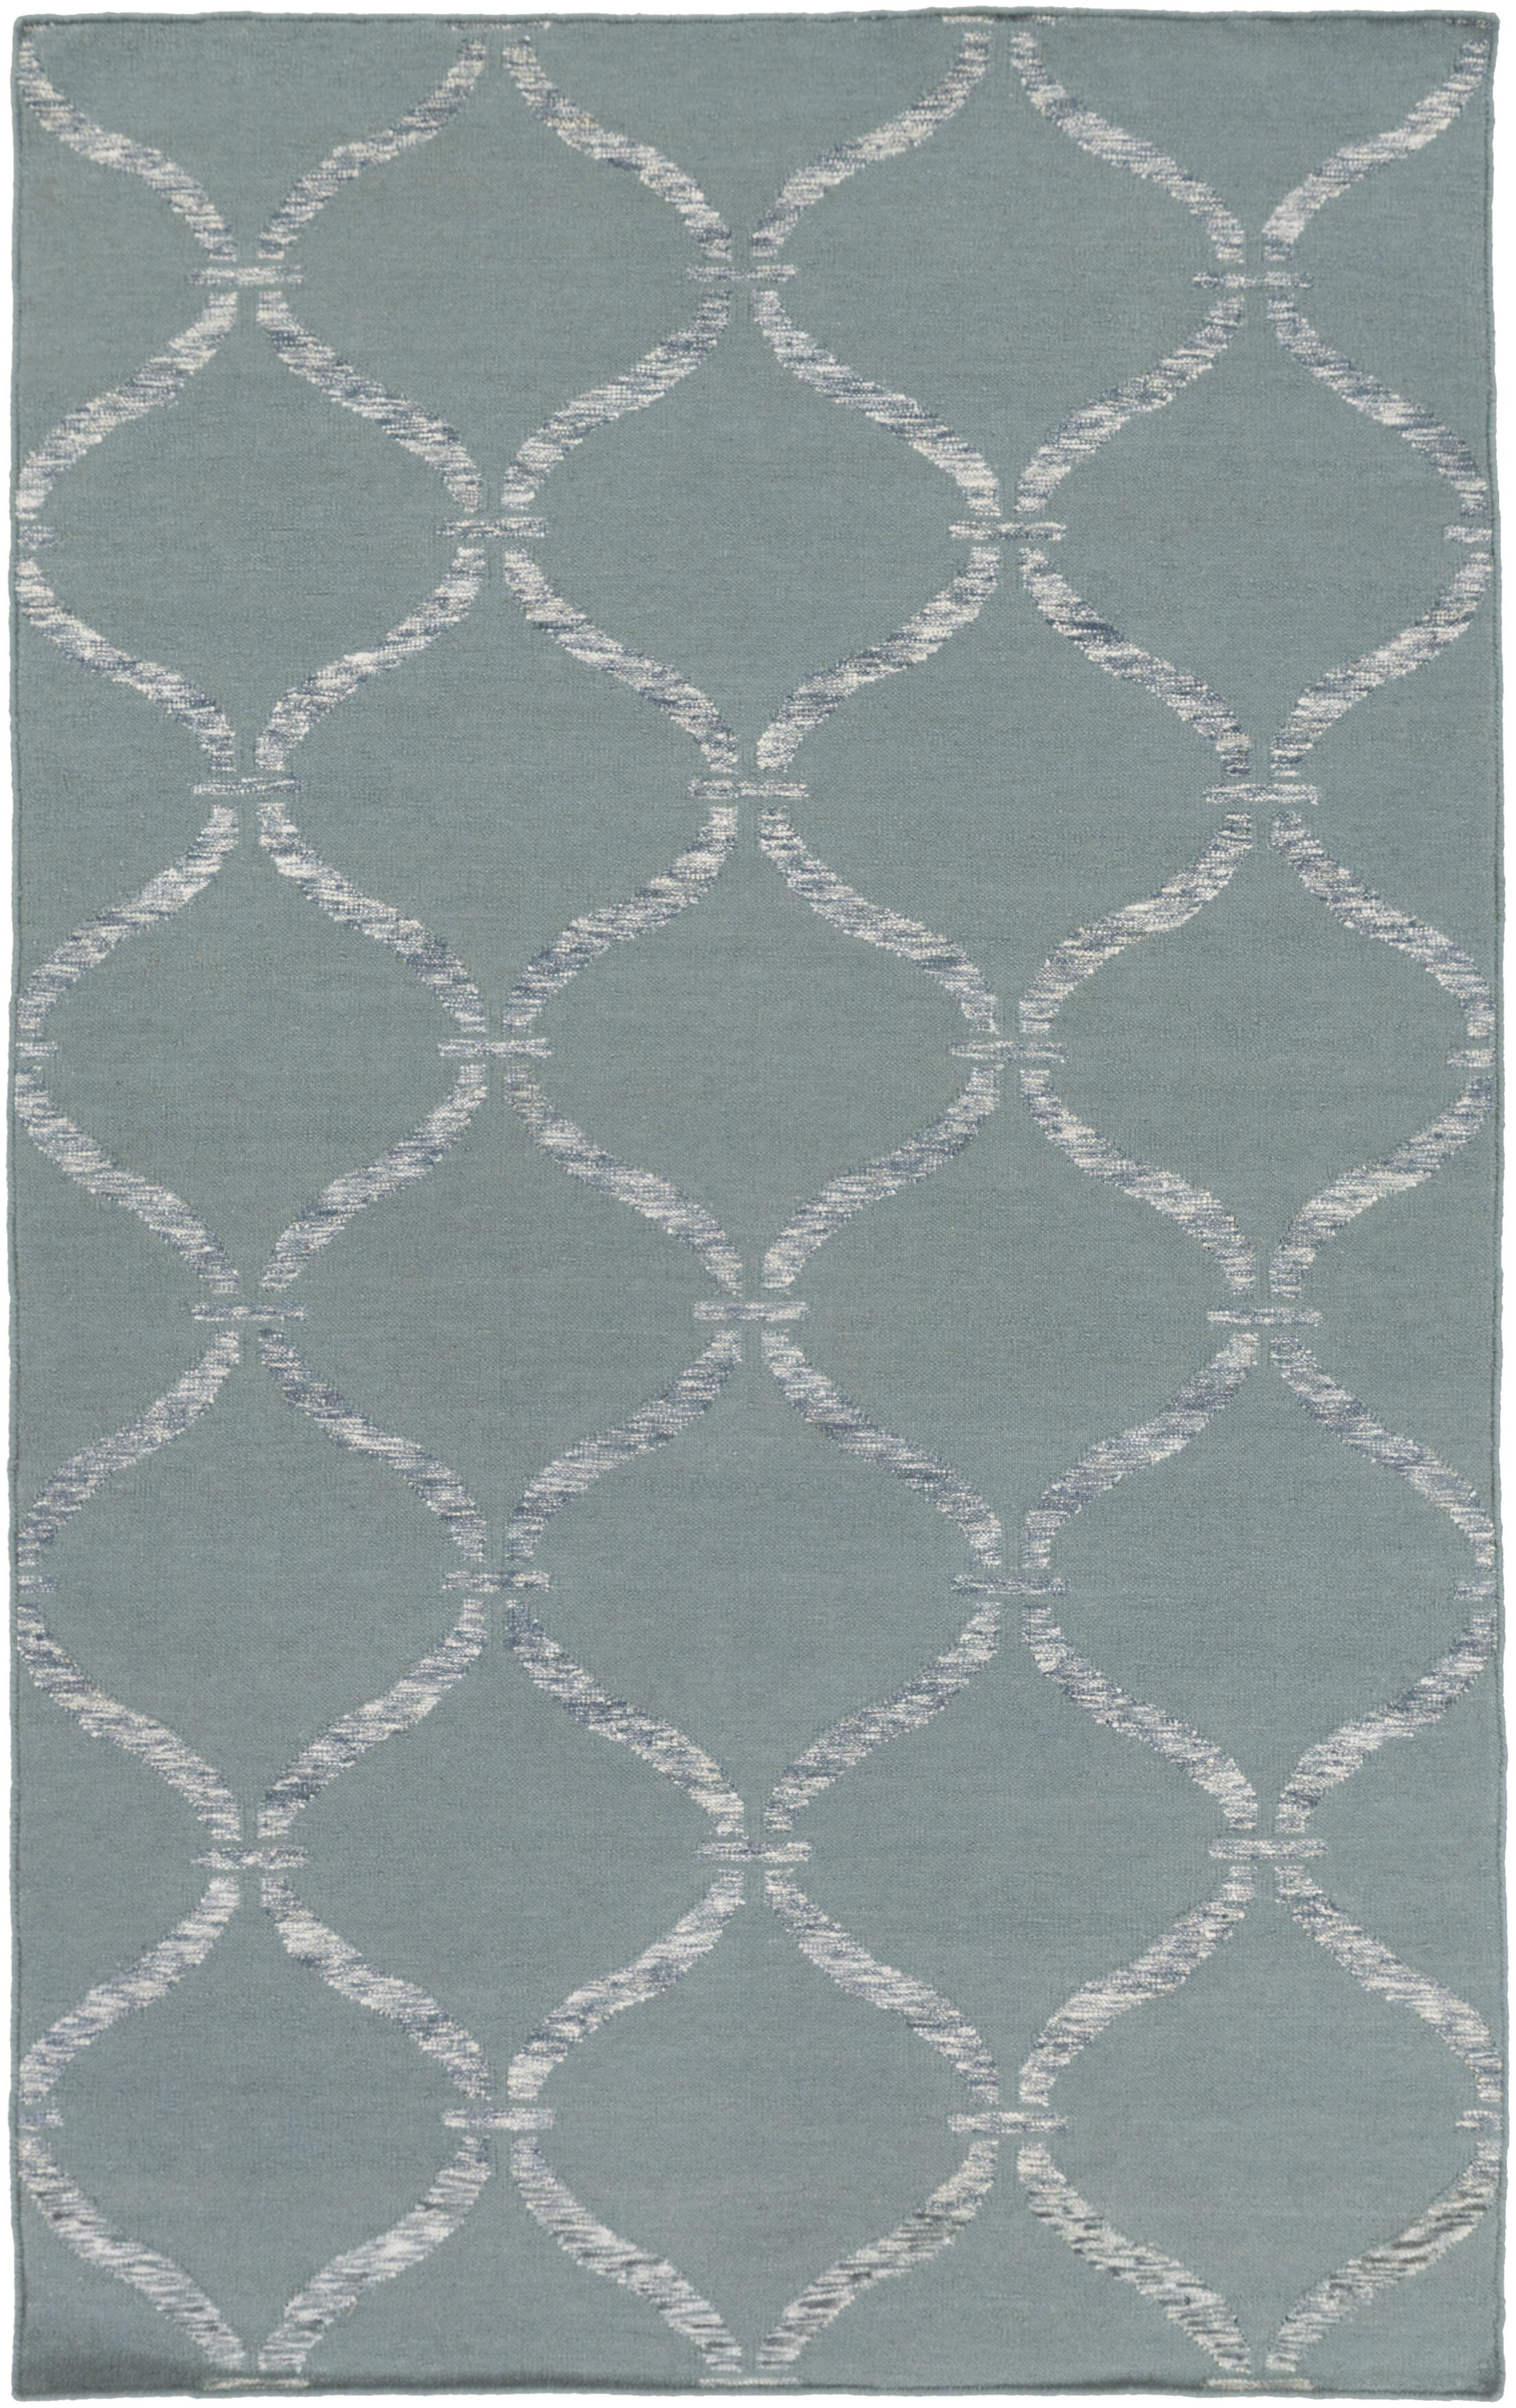 Landing Hand Woven Gray Area Rug Rug Size: Rectangle 4' x 6'